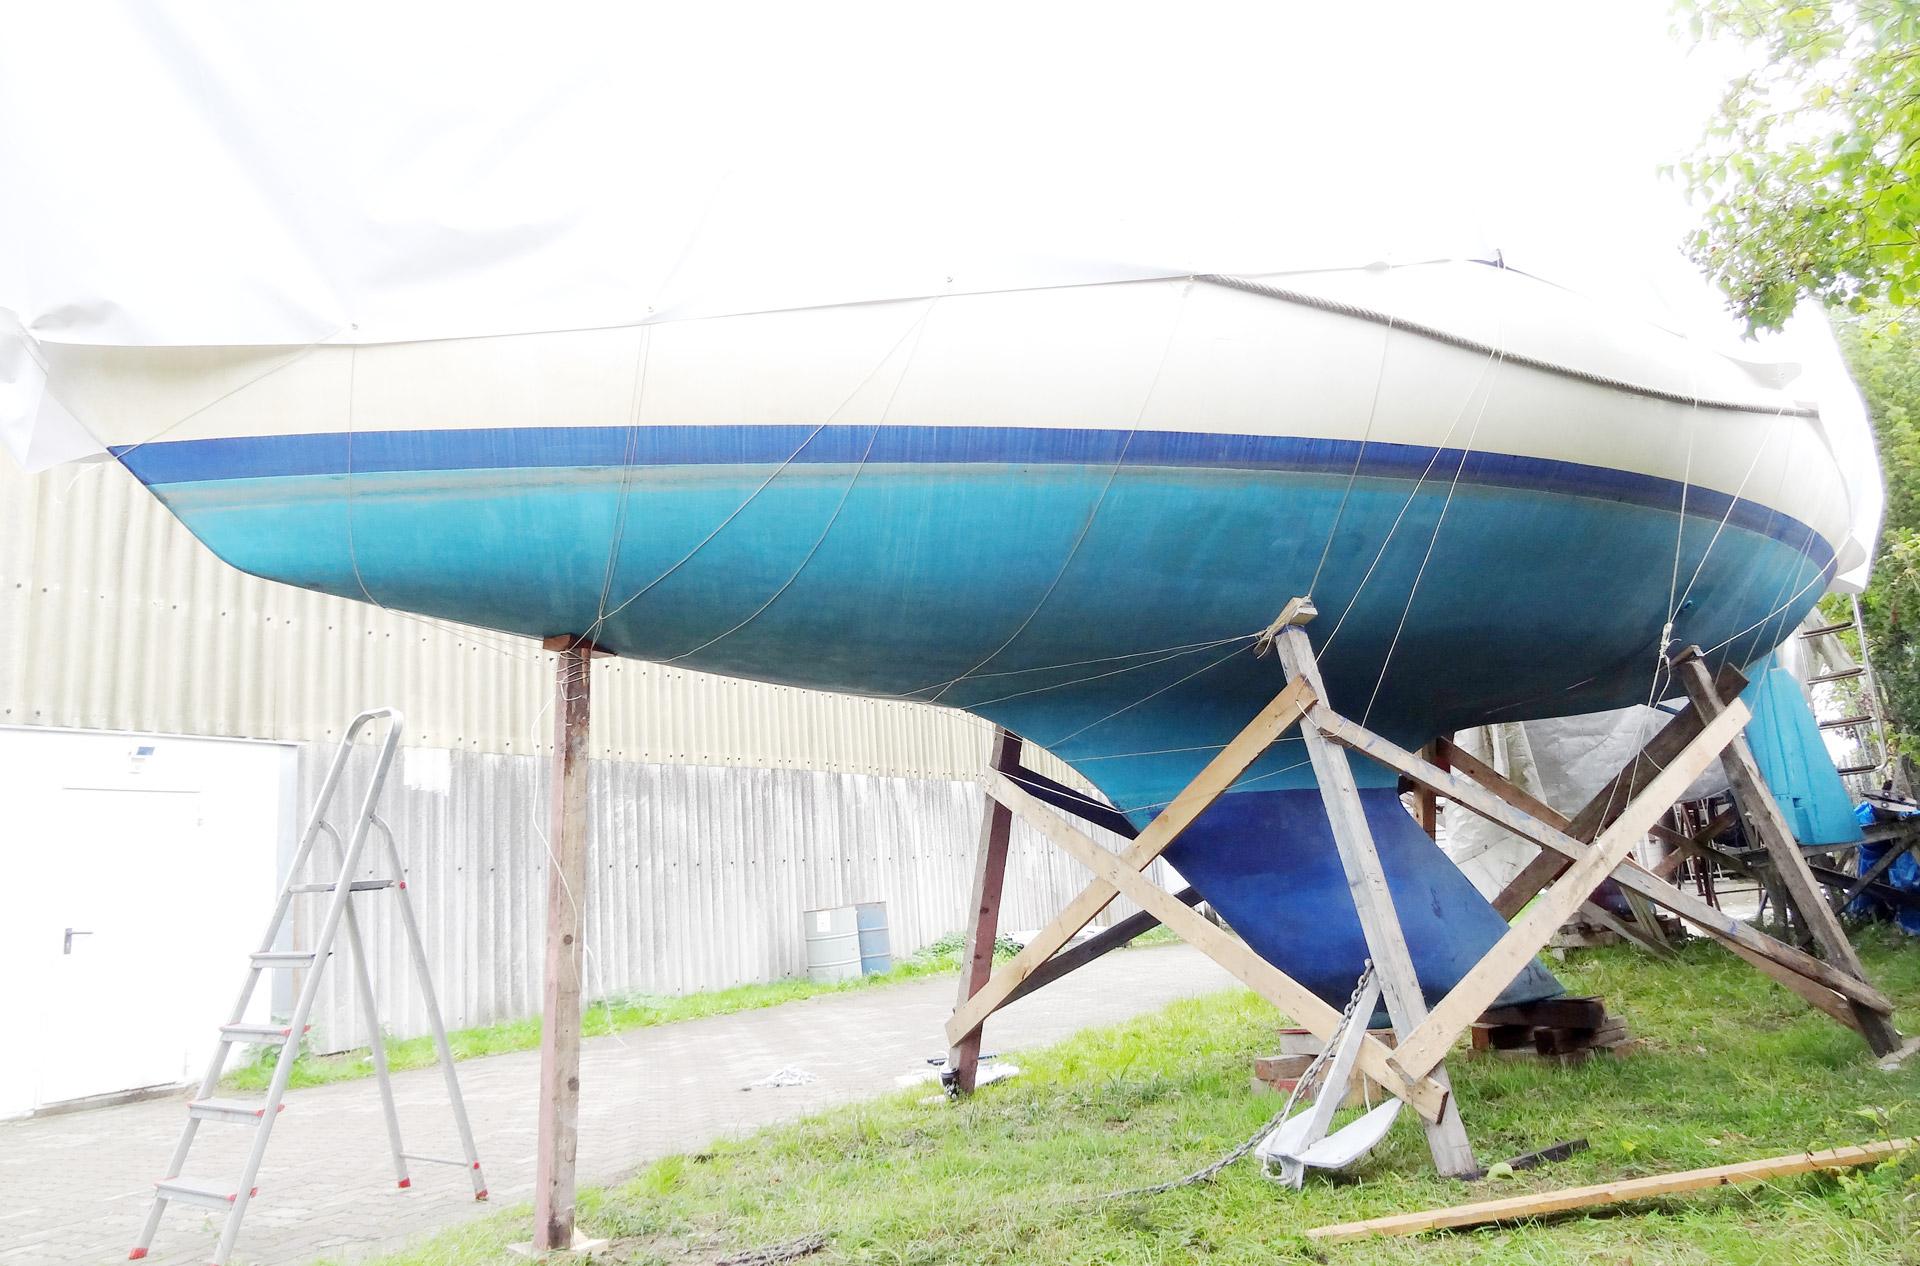 Tarpaulin for sailing yachts: Is DIY an alternative?